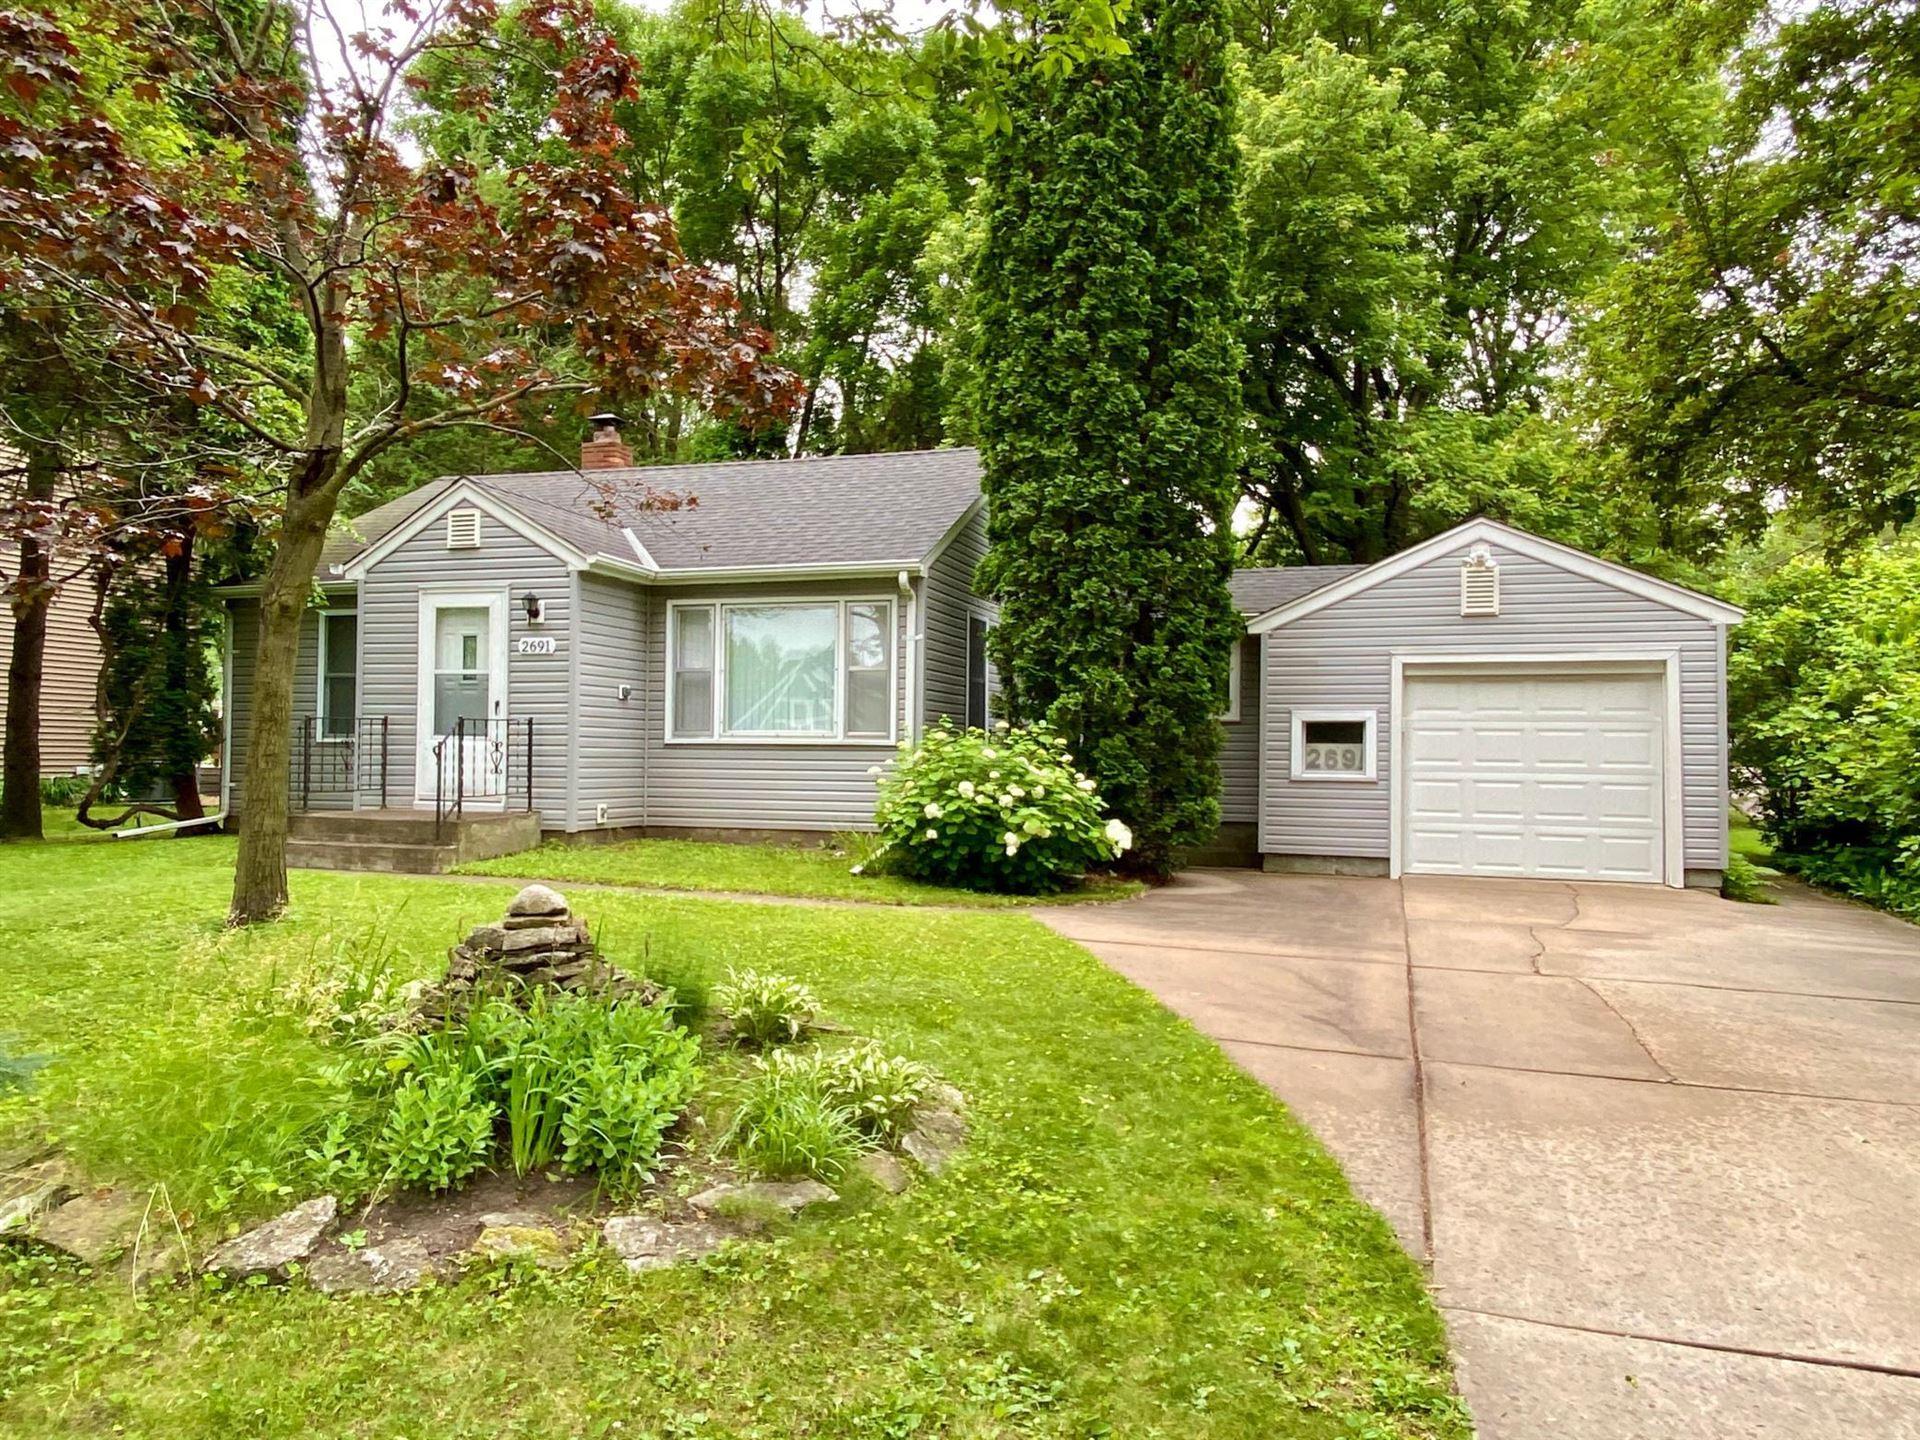 2691 Lake Shore Avenue, Little Canada, MN 55117 - MLS#: 5613505